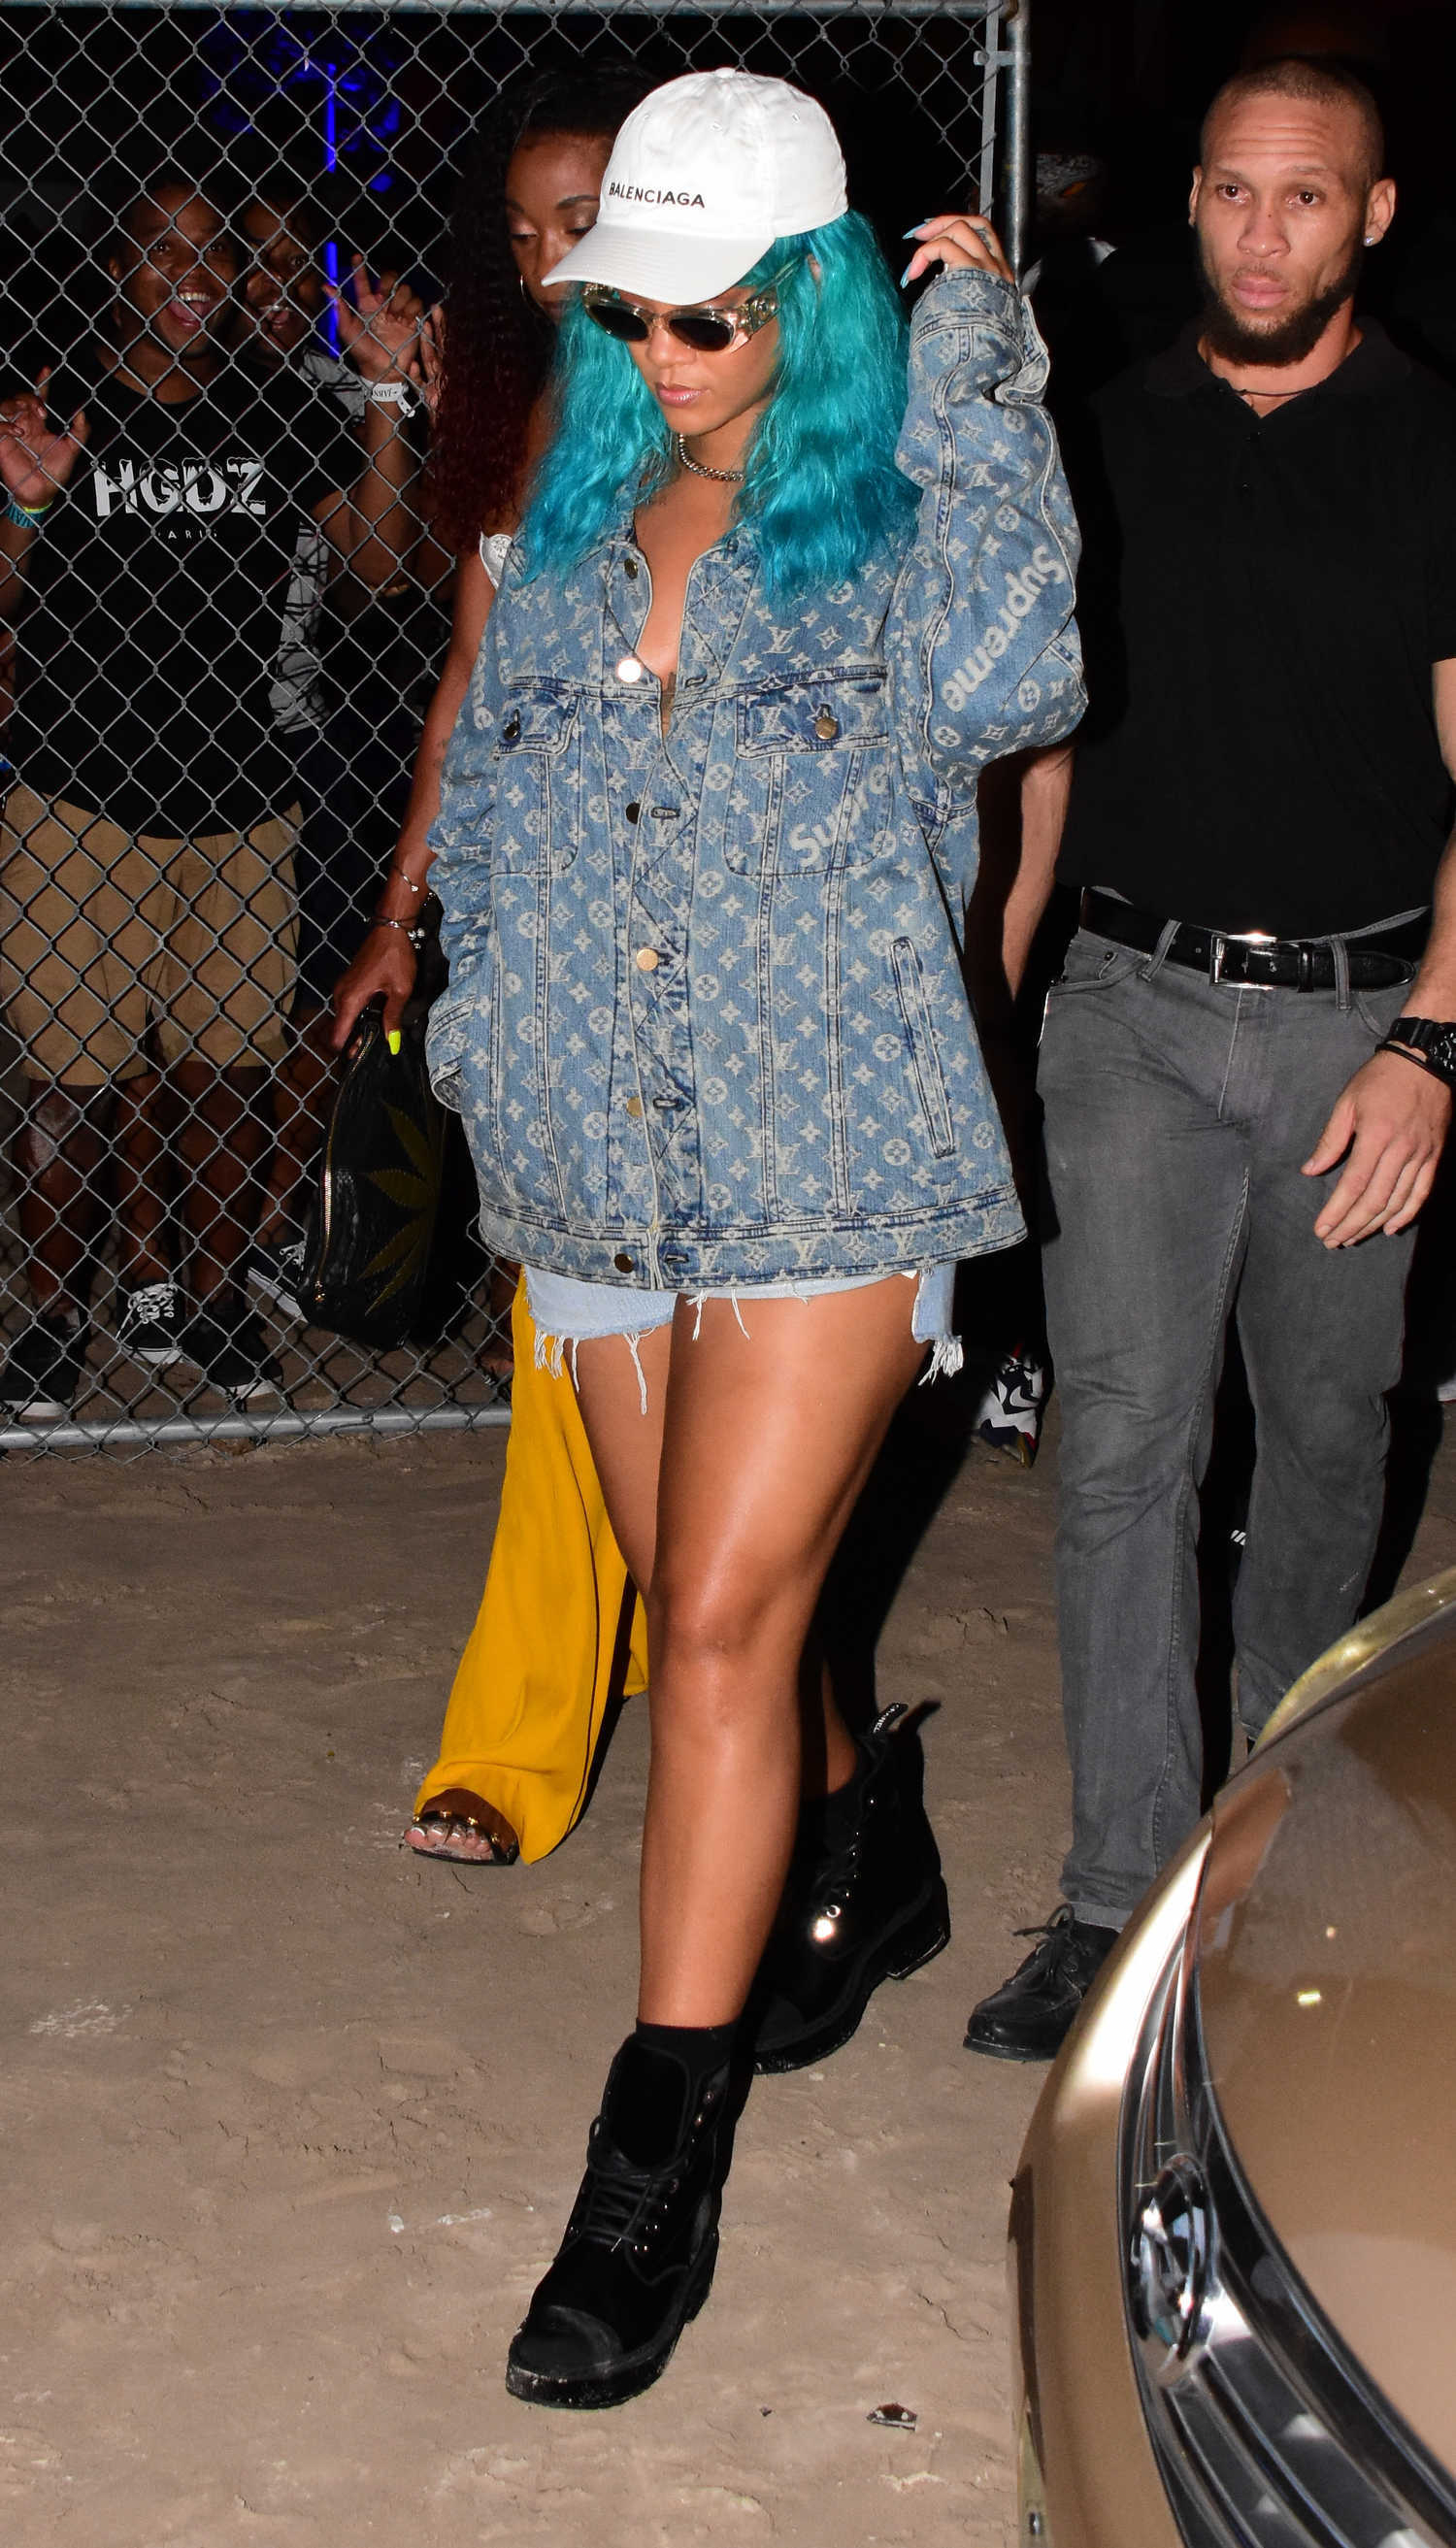 Rihanna barbados carnival 2013 agree, the